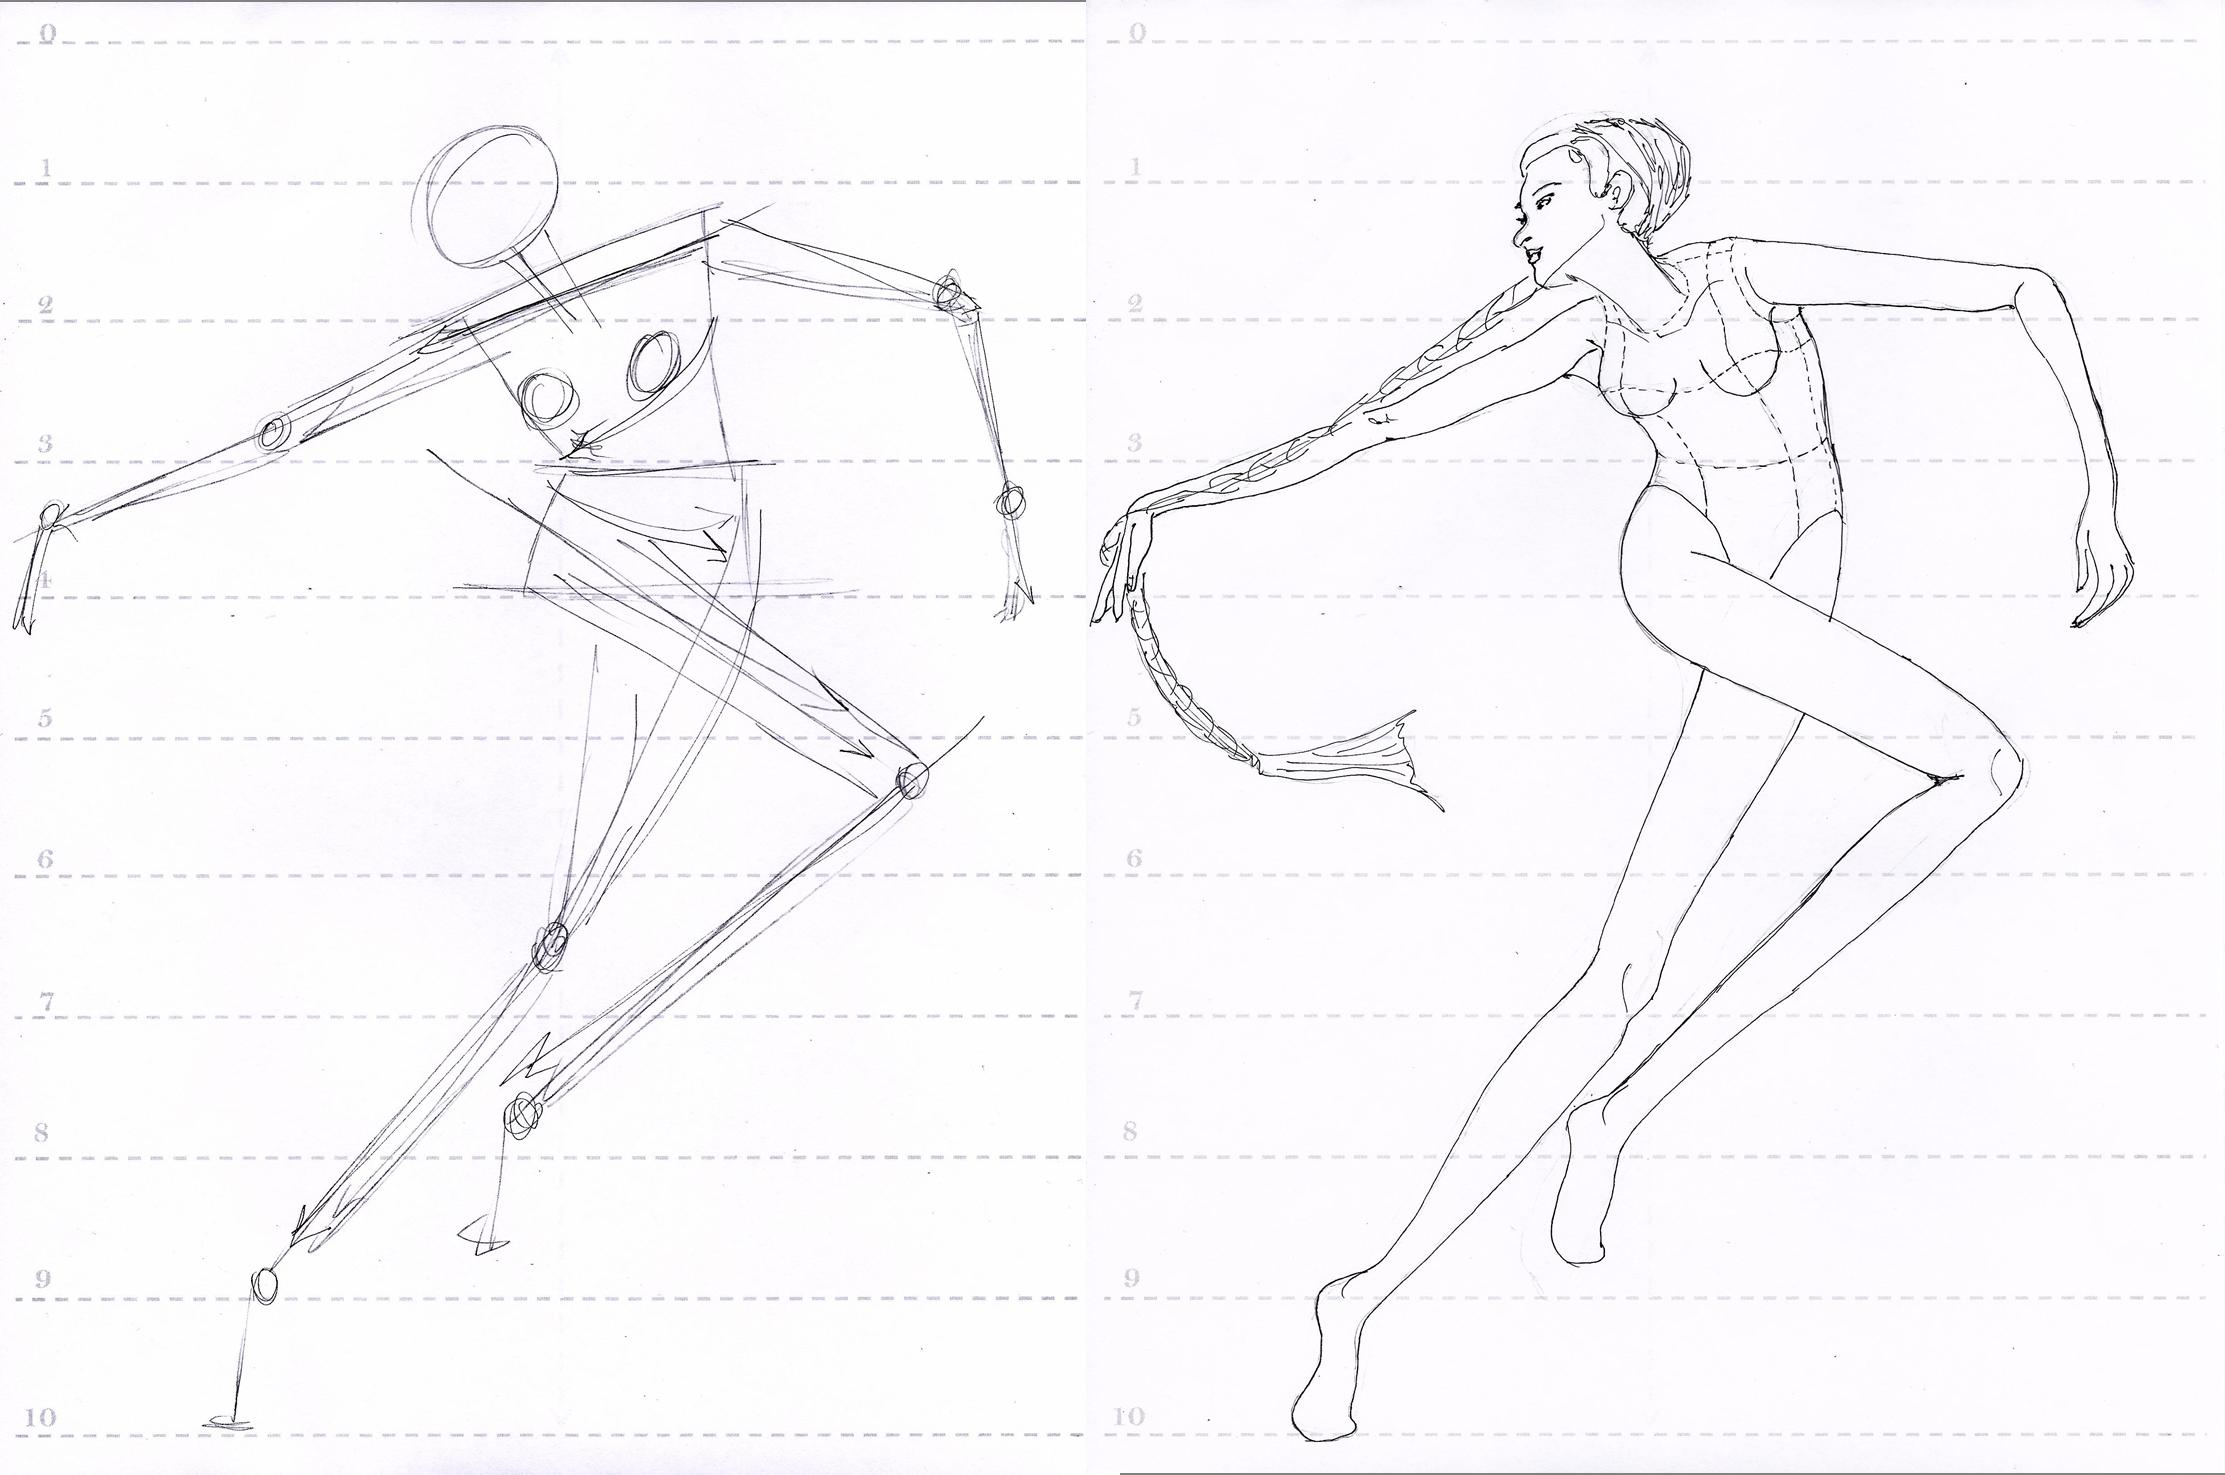 croquis poses dctdesigns creative canvas